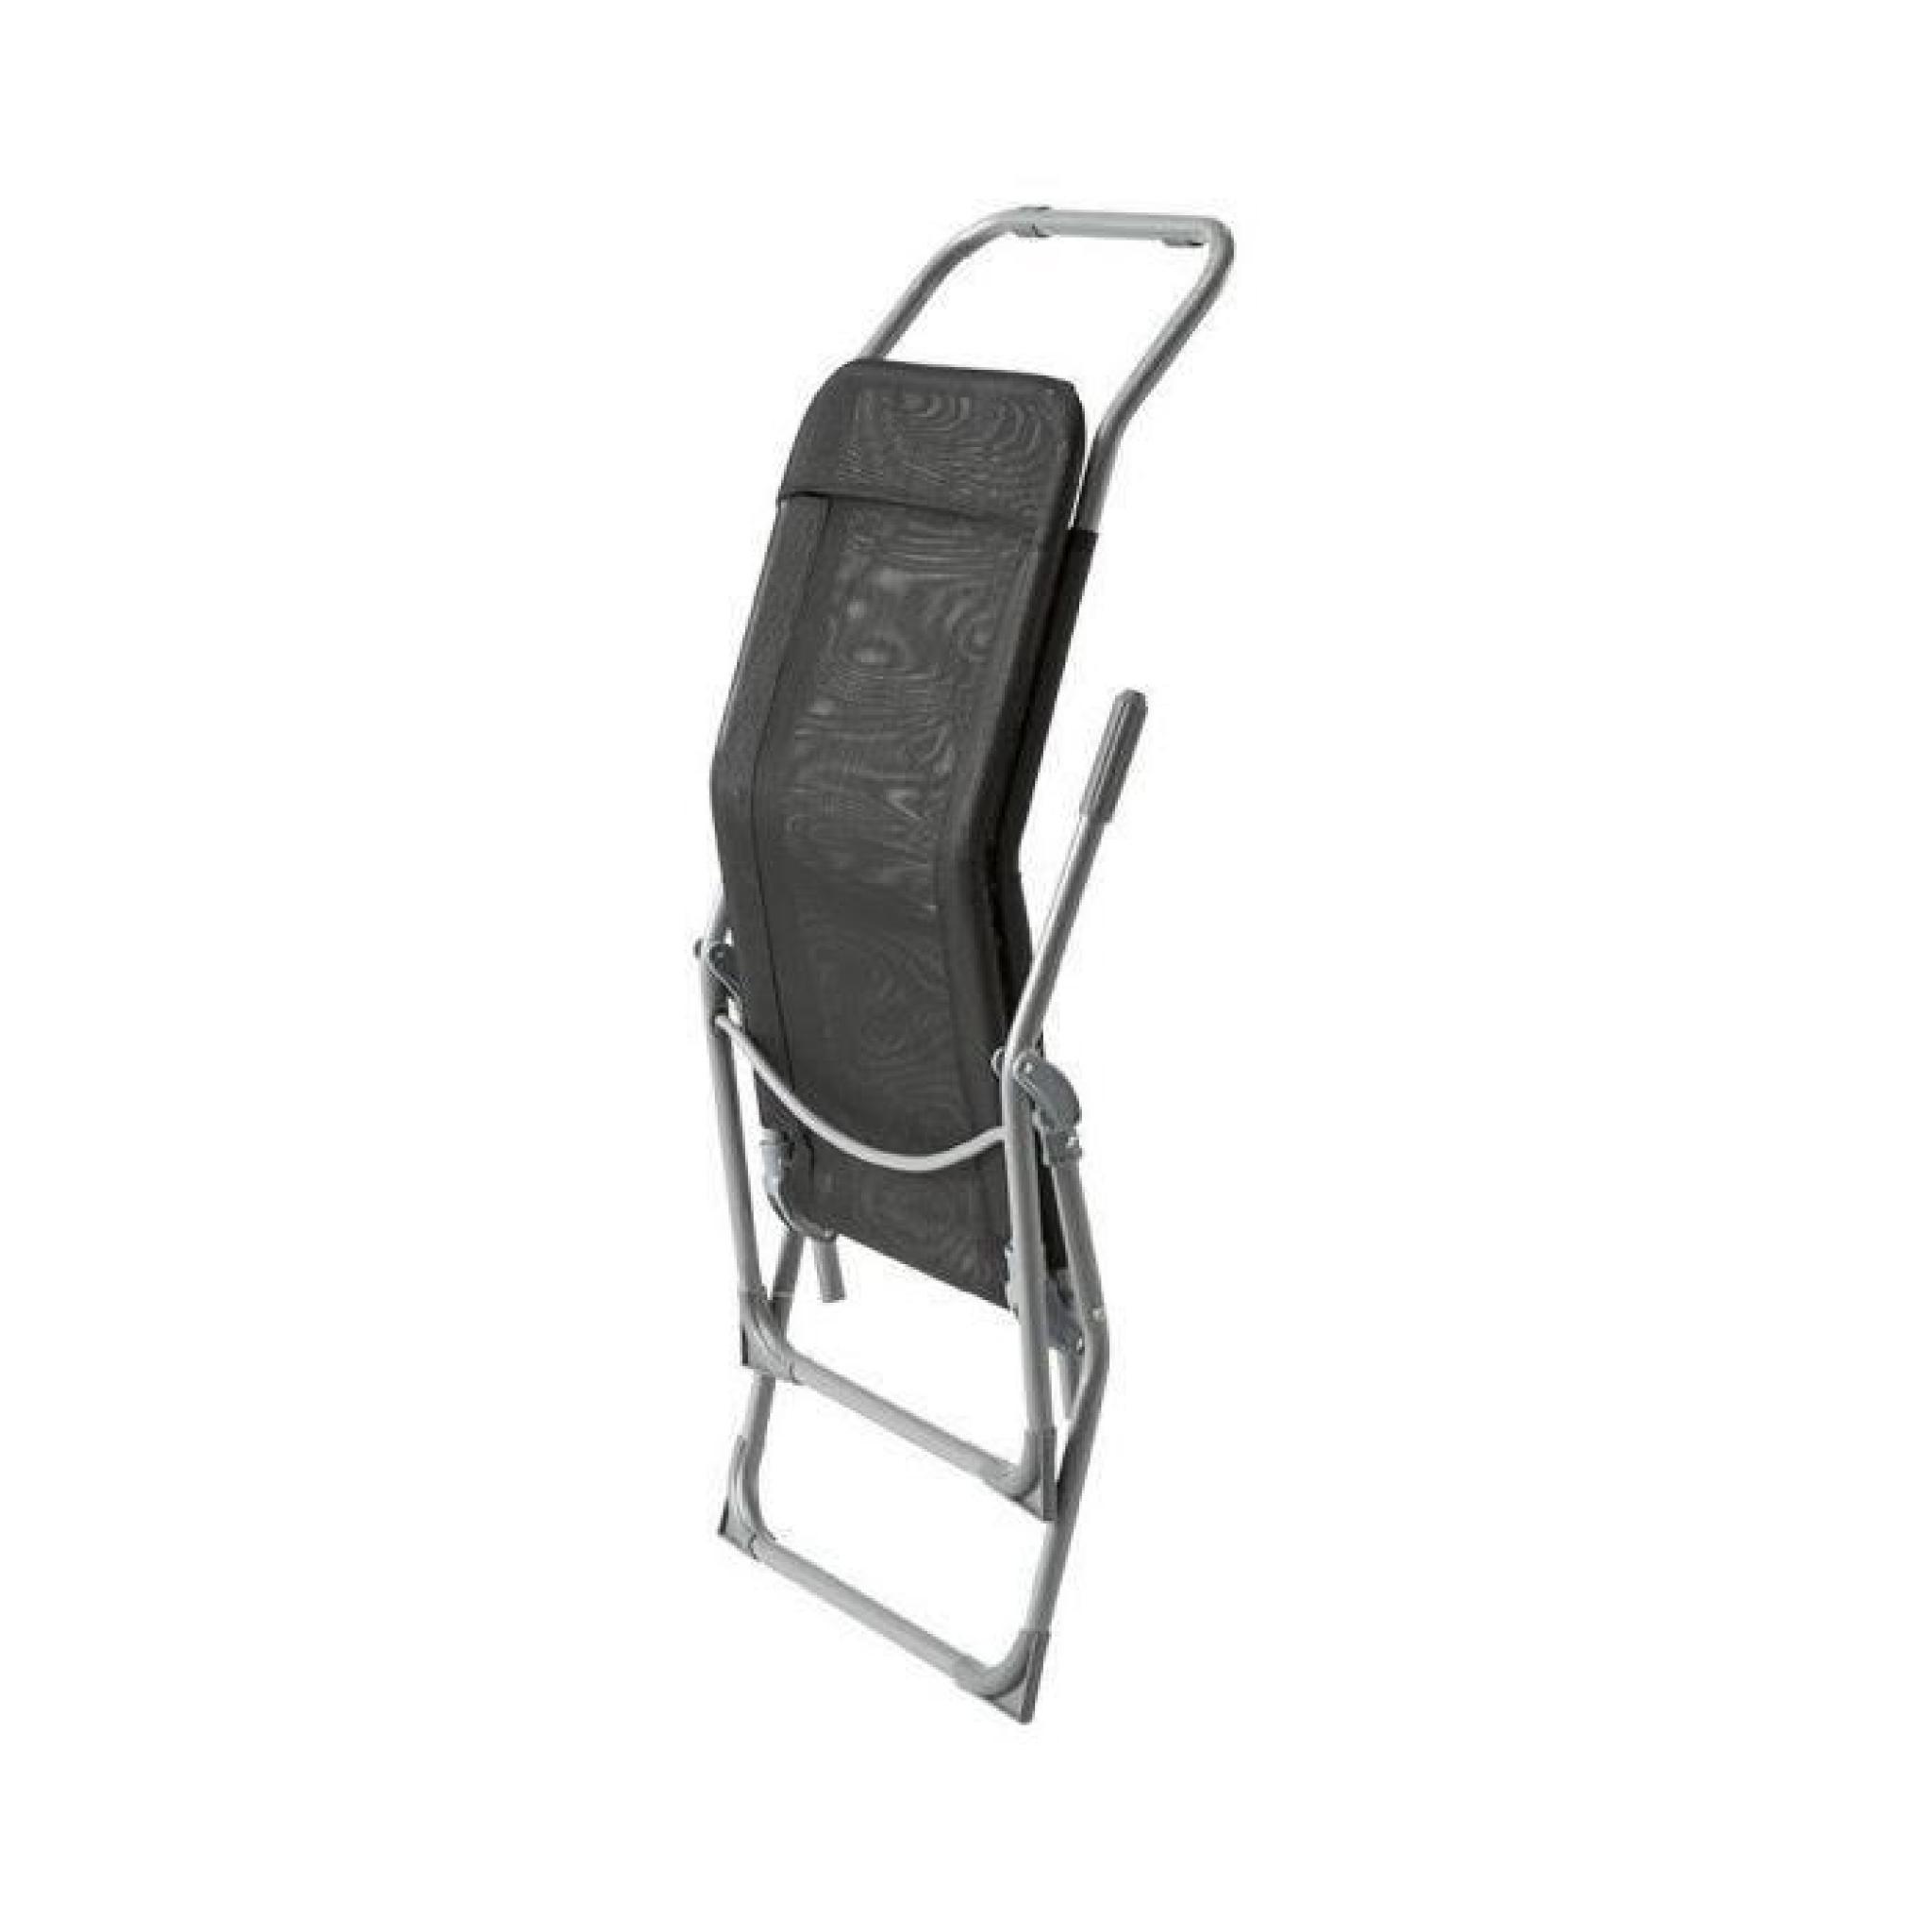 chaise longue siesta hesperide noir achat vente transat. Black Bedroom Furniture Sets. Home Design Ideas